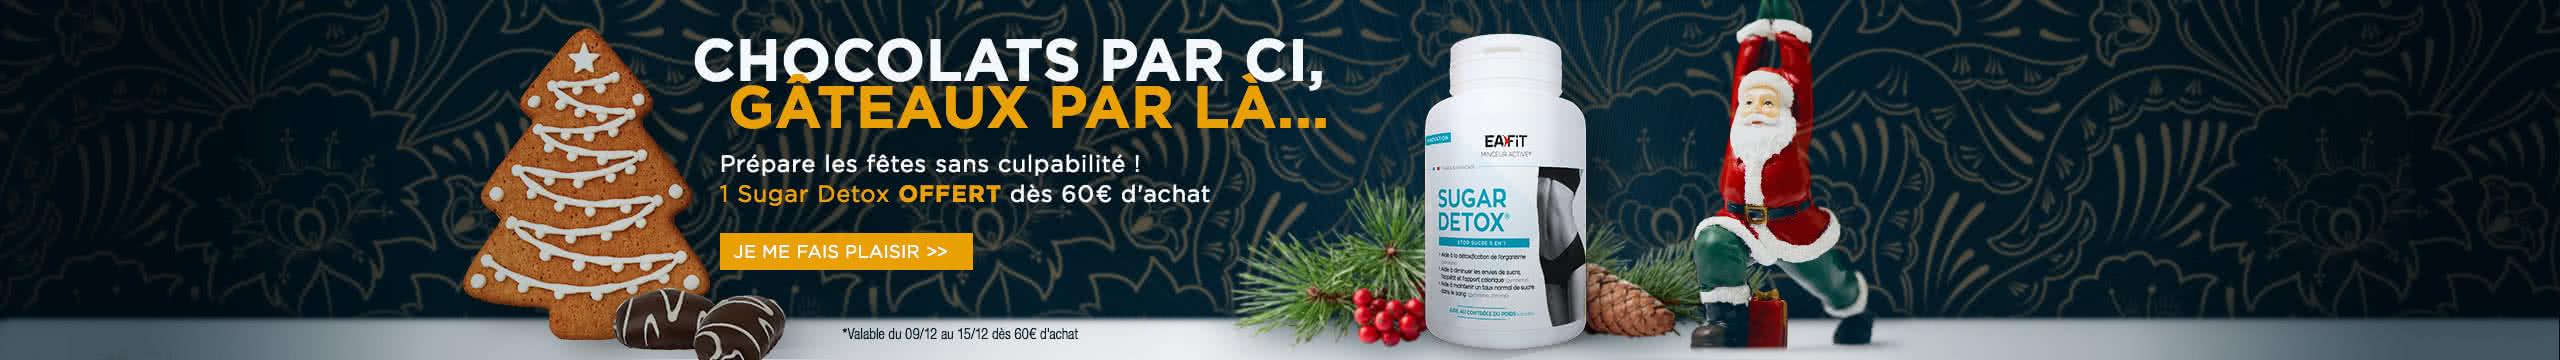 NL-Promo-Sugar-Detox